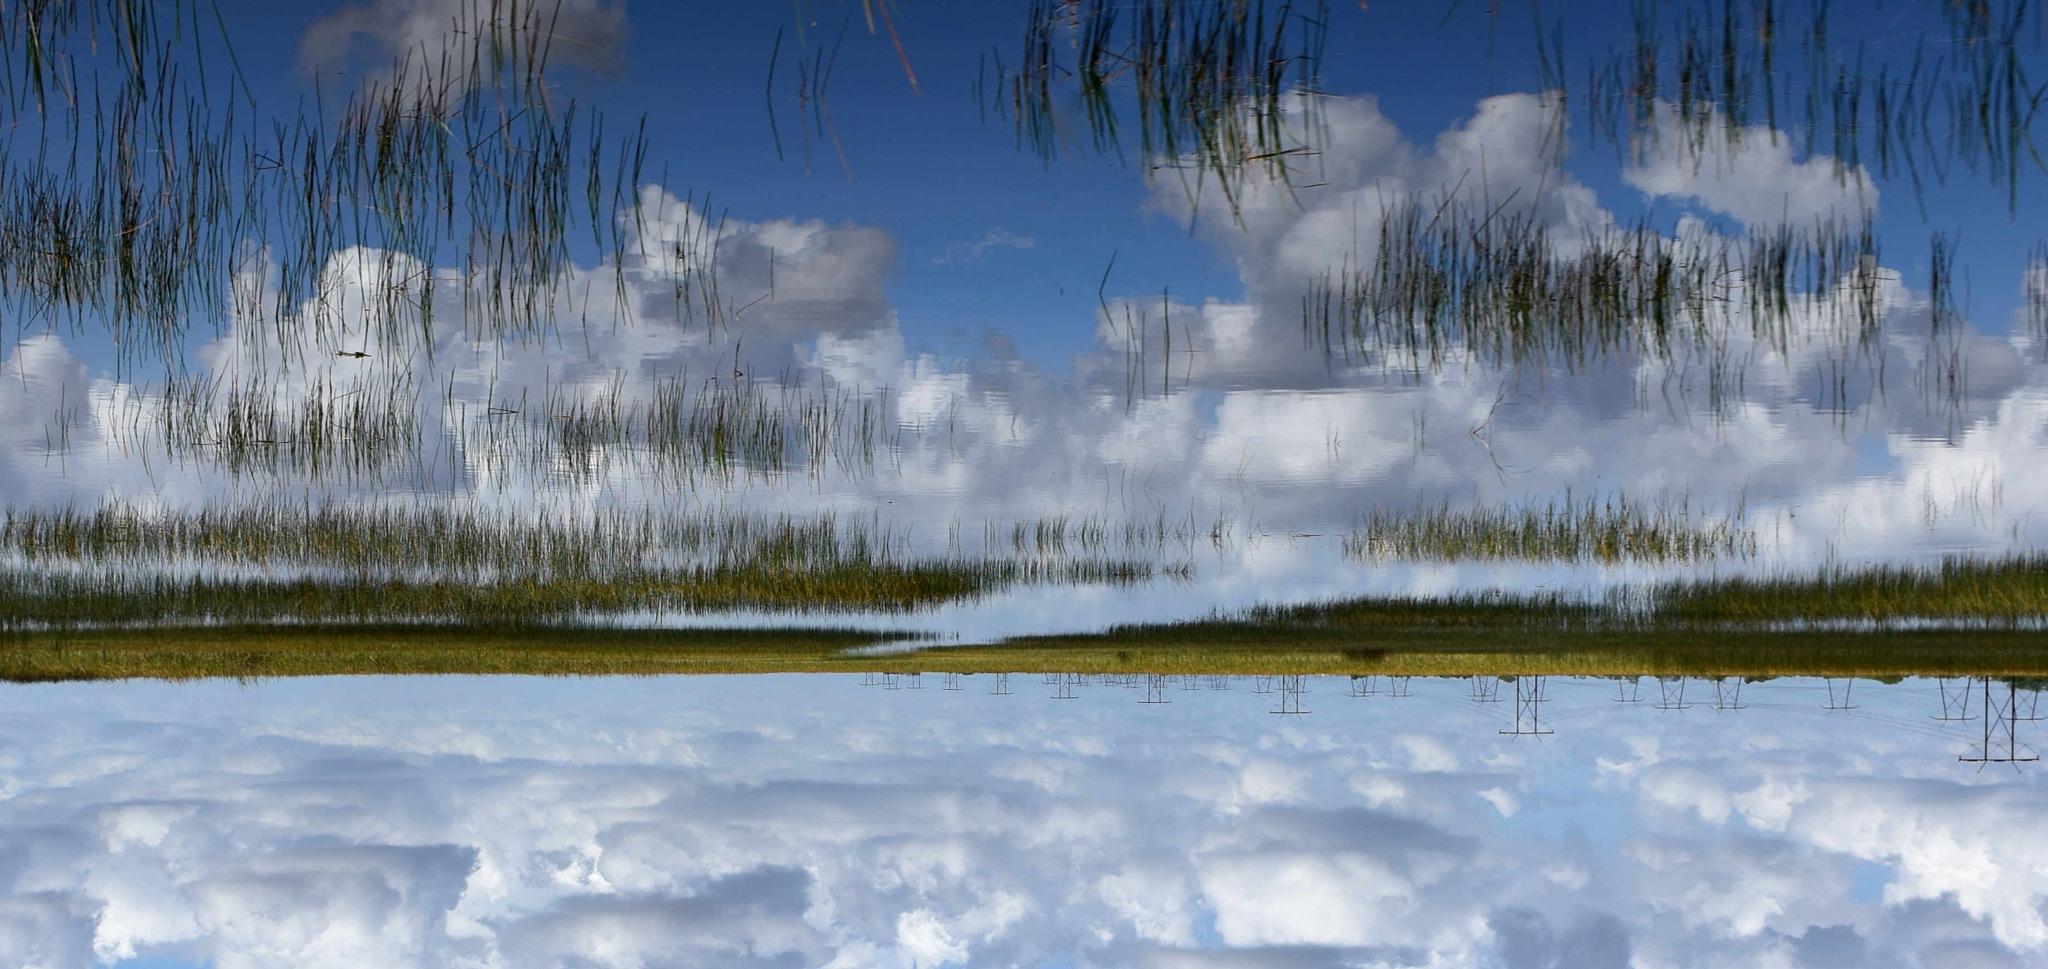 Everglades by jpzalaquett